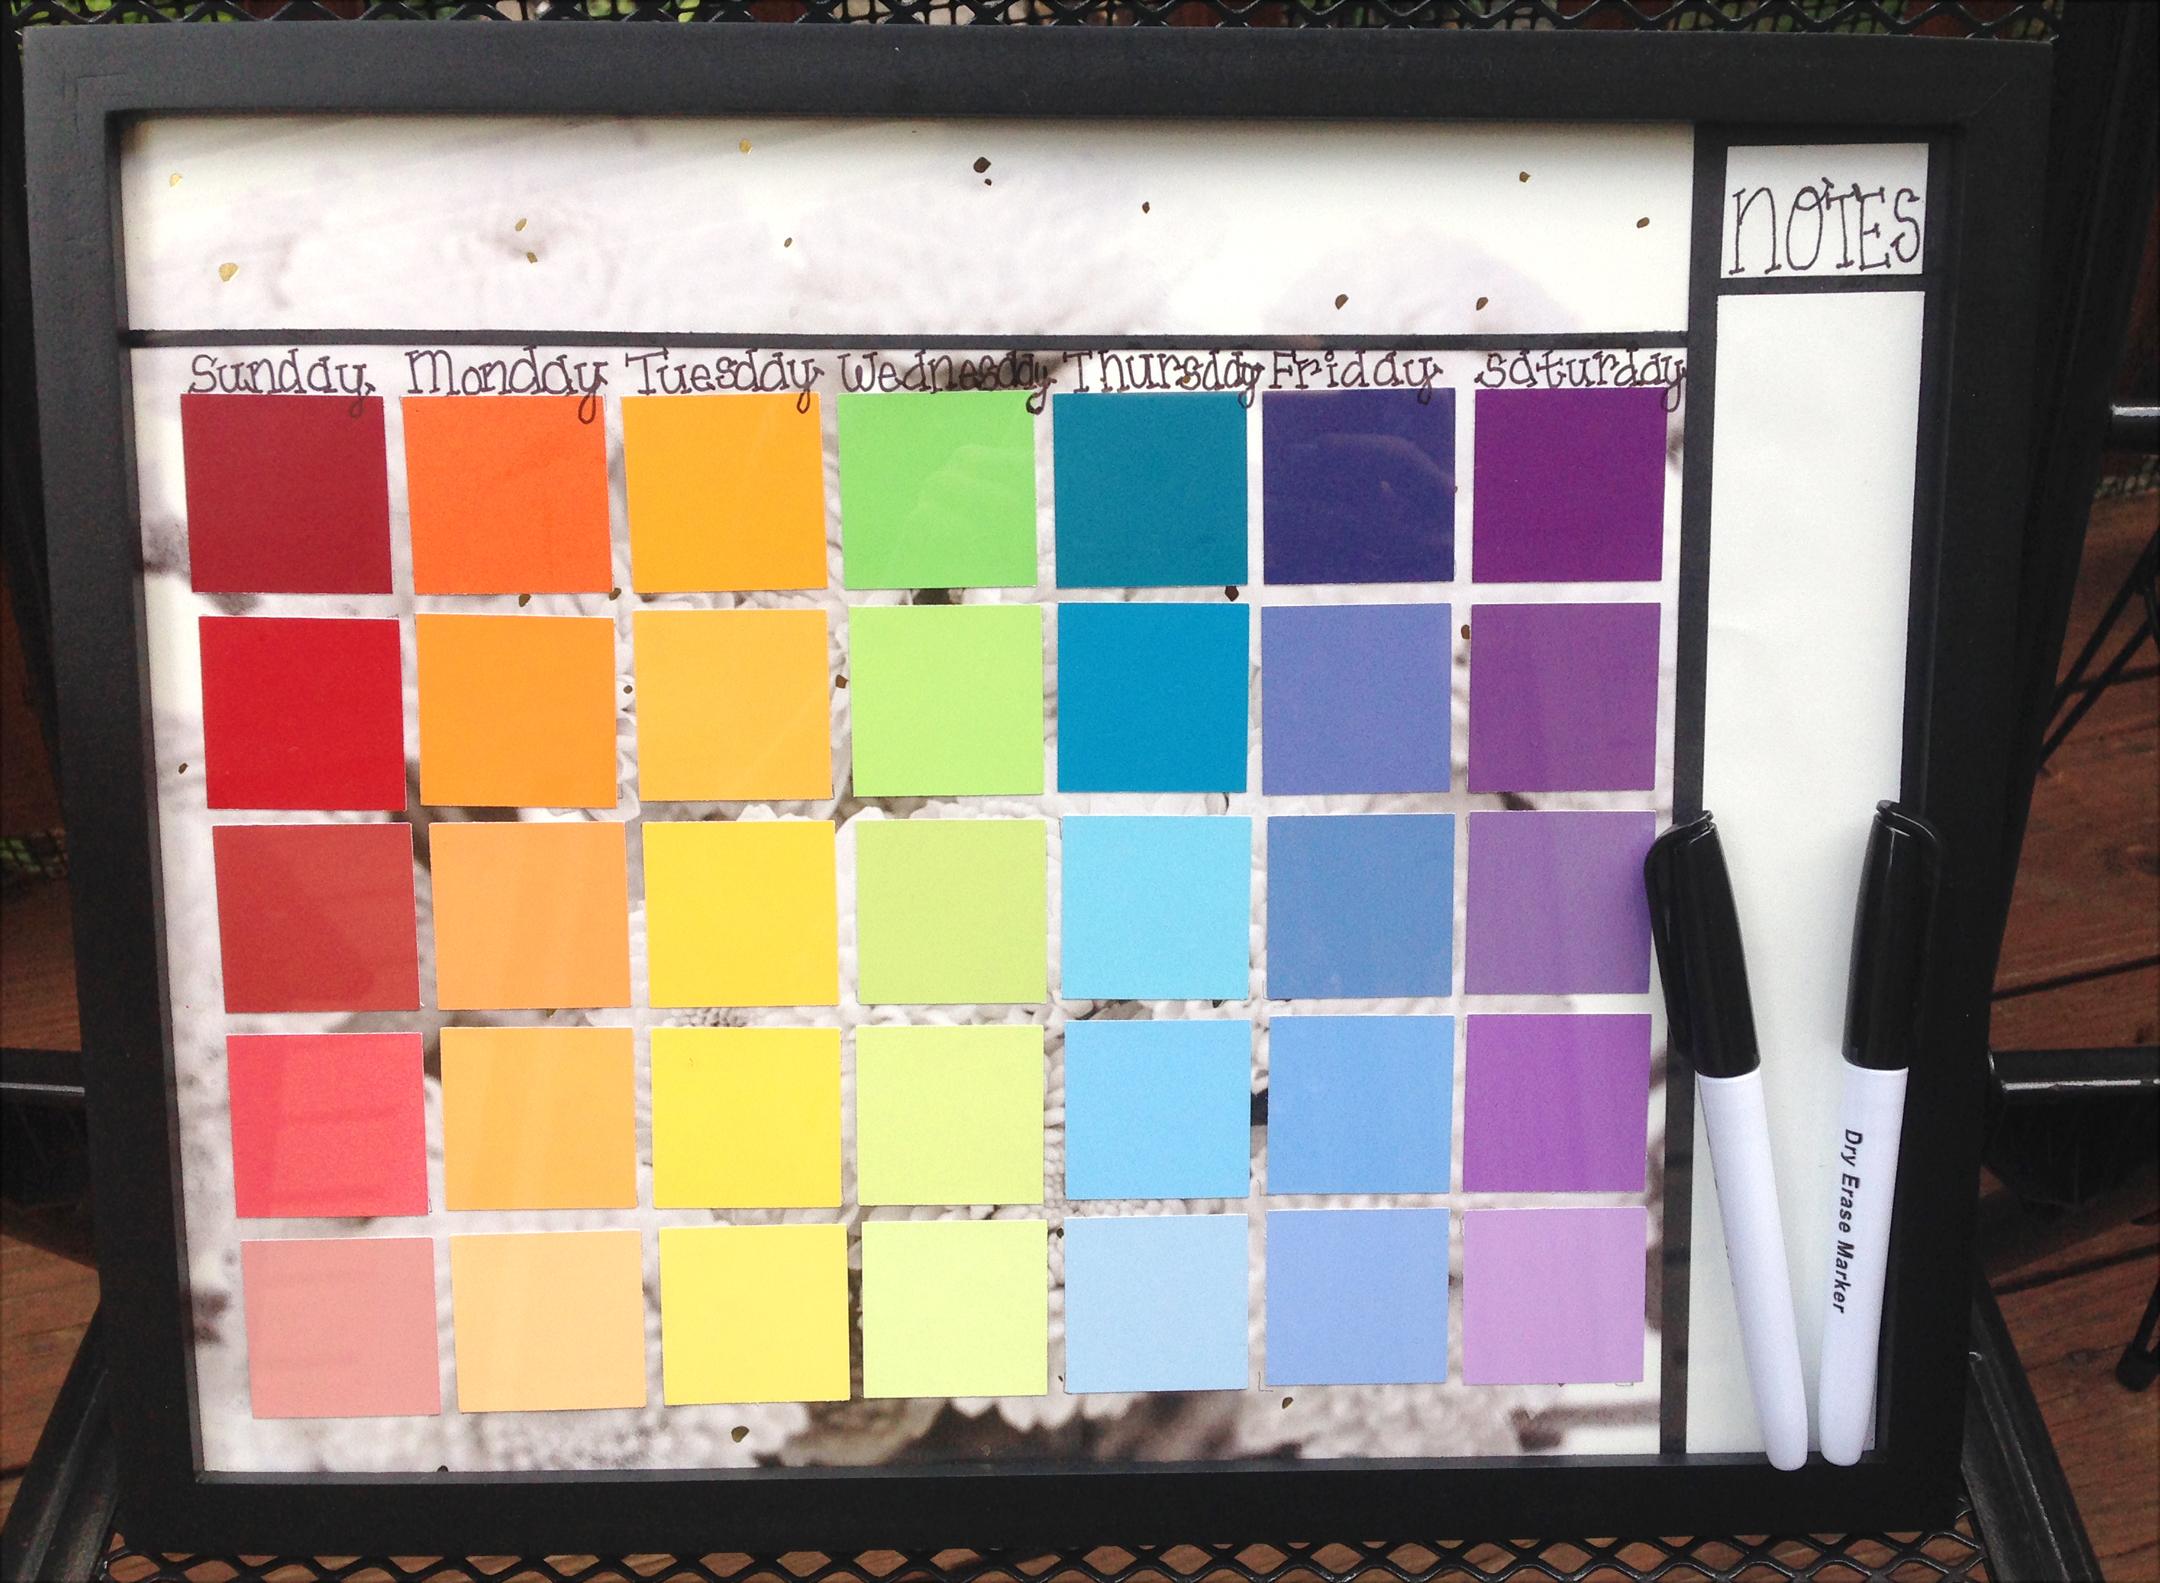 DIY Dry Erase Calendar with Paint Samples